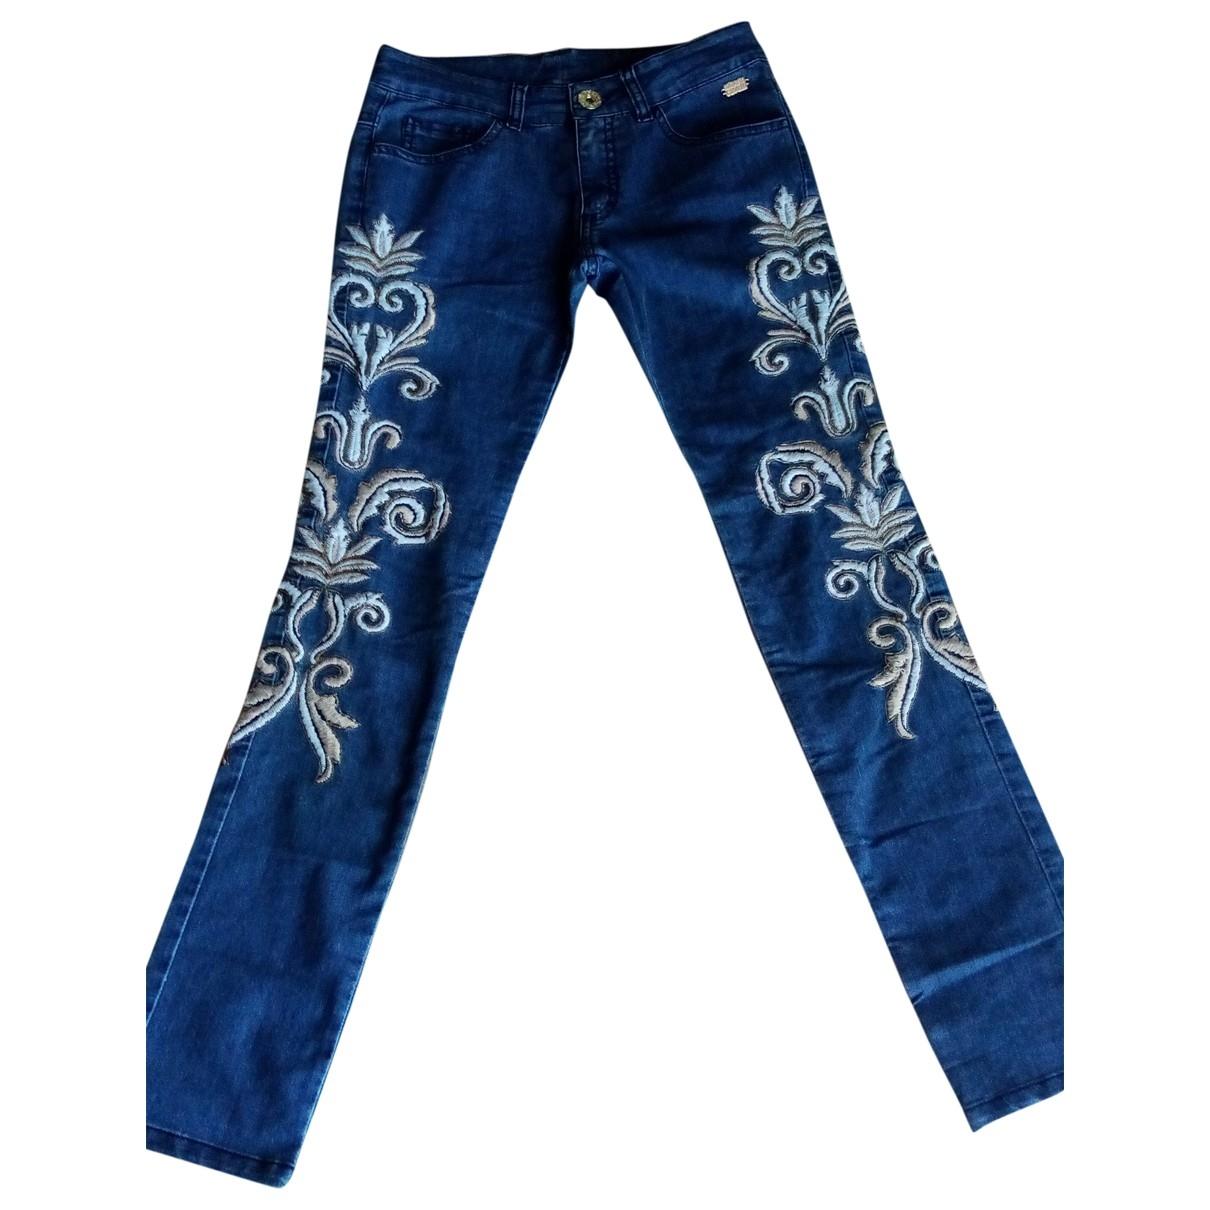 Roberto Cavalli \N Blue Denim - Jeans Trousers for Kids 12 years - XS FR